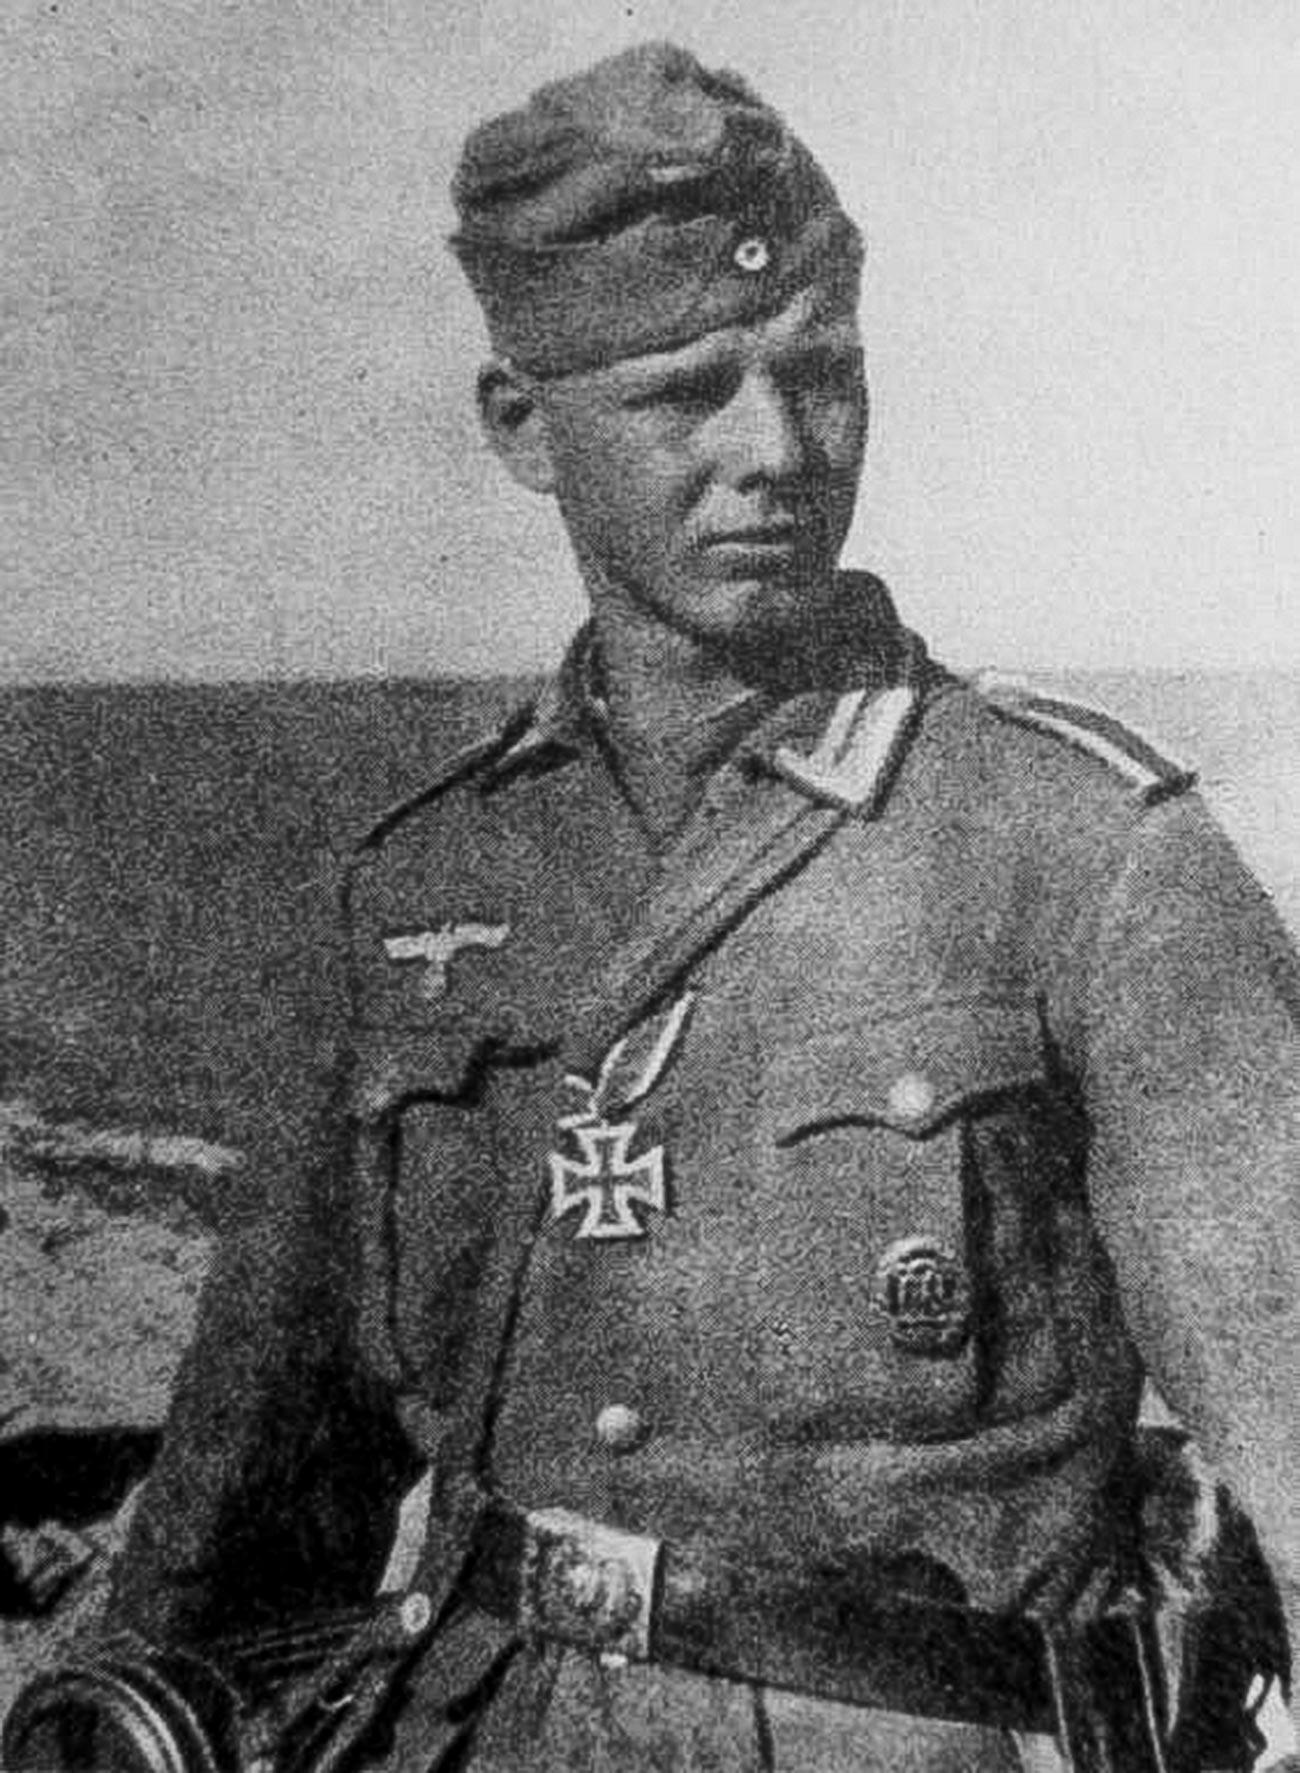 Heinz Hitler